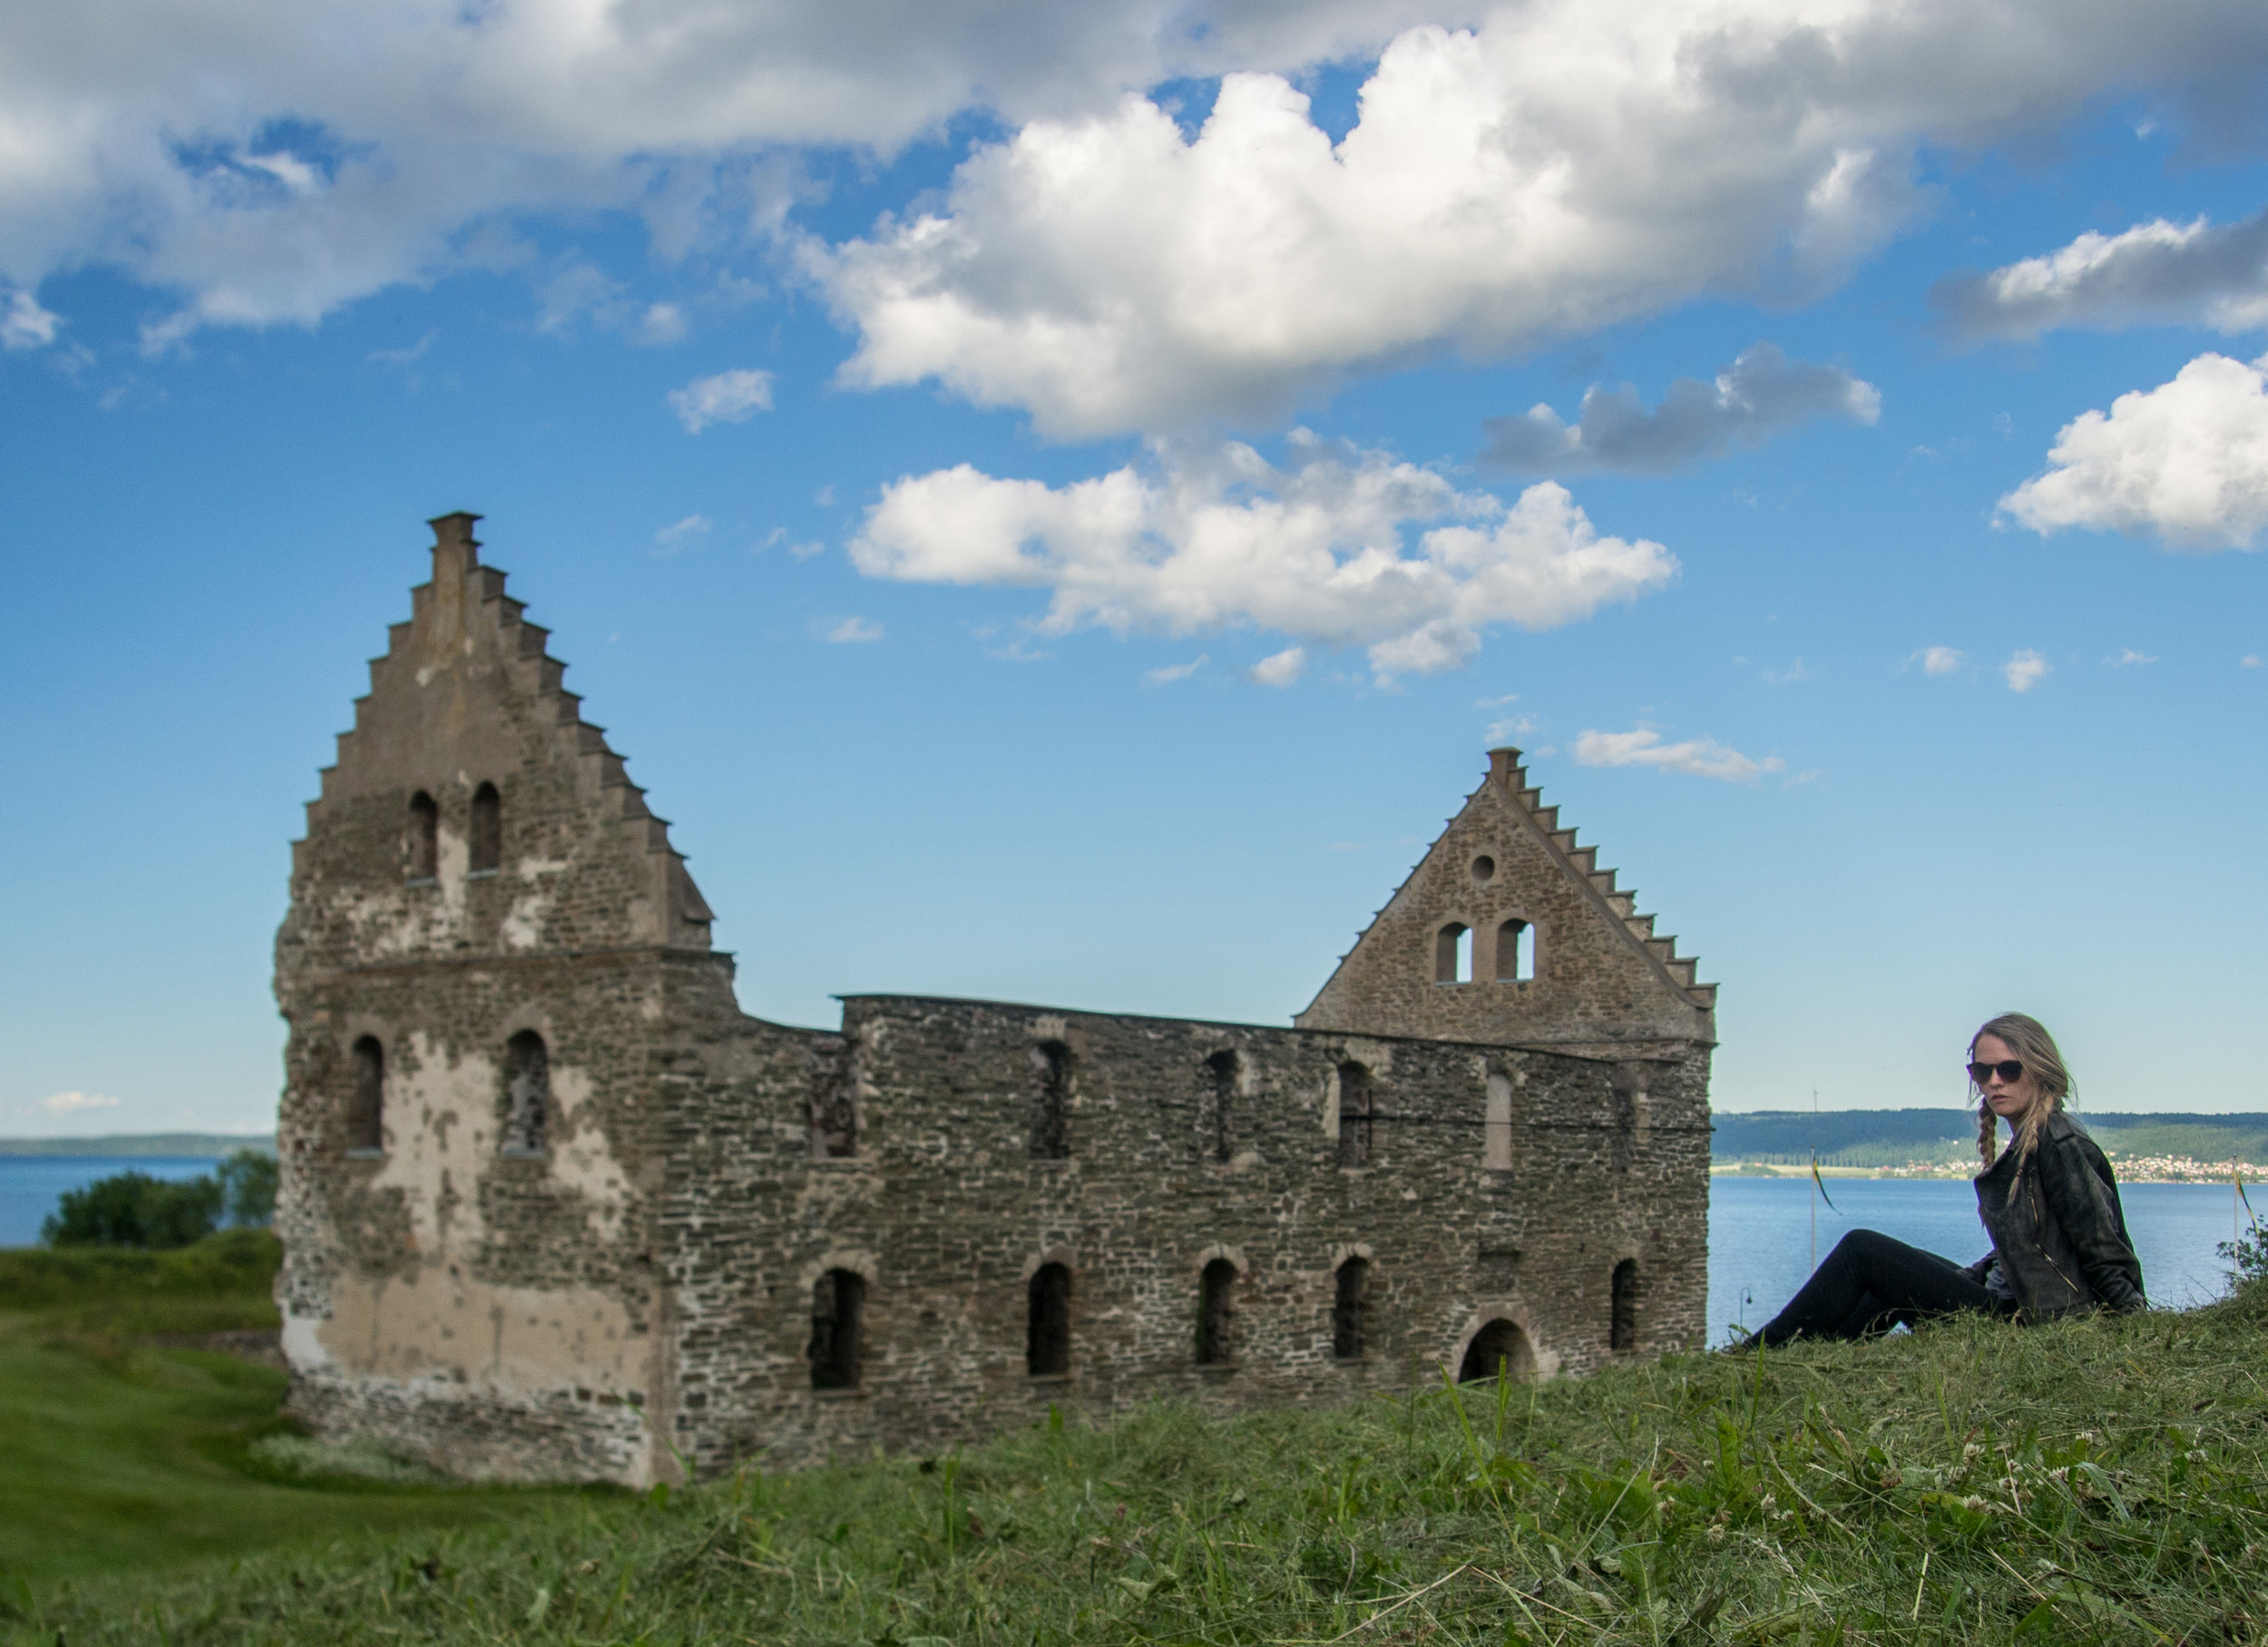 Castle ruin of Visingsborg on the island of Visingsö